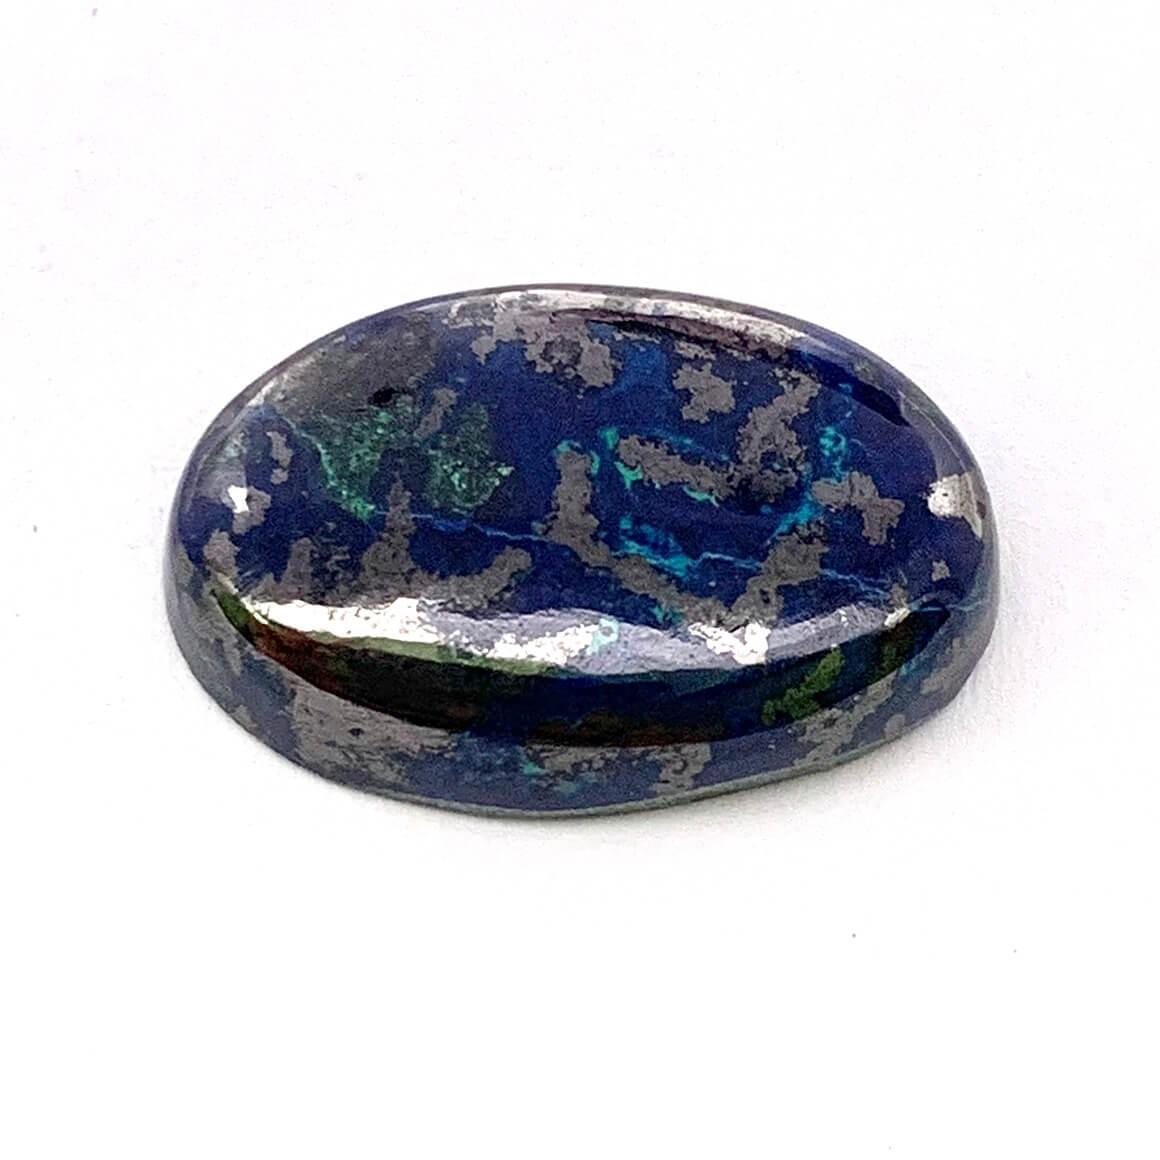 19.73 Carat Natural Azurite Gemstone